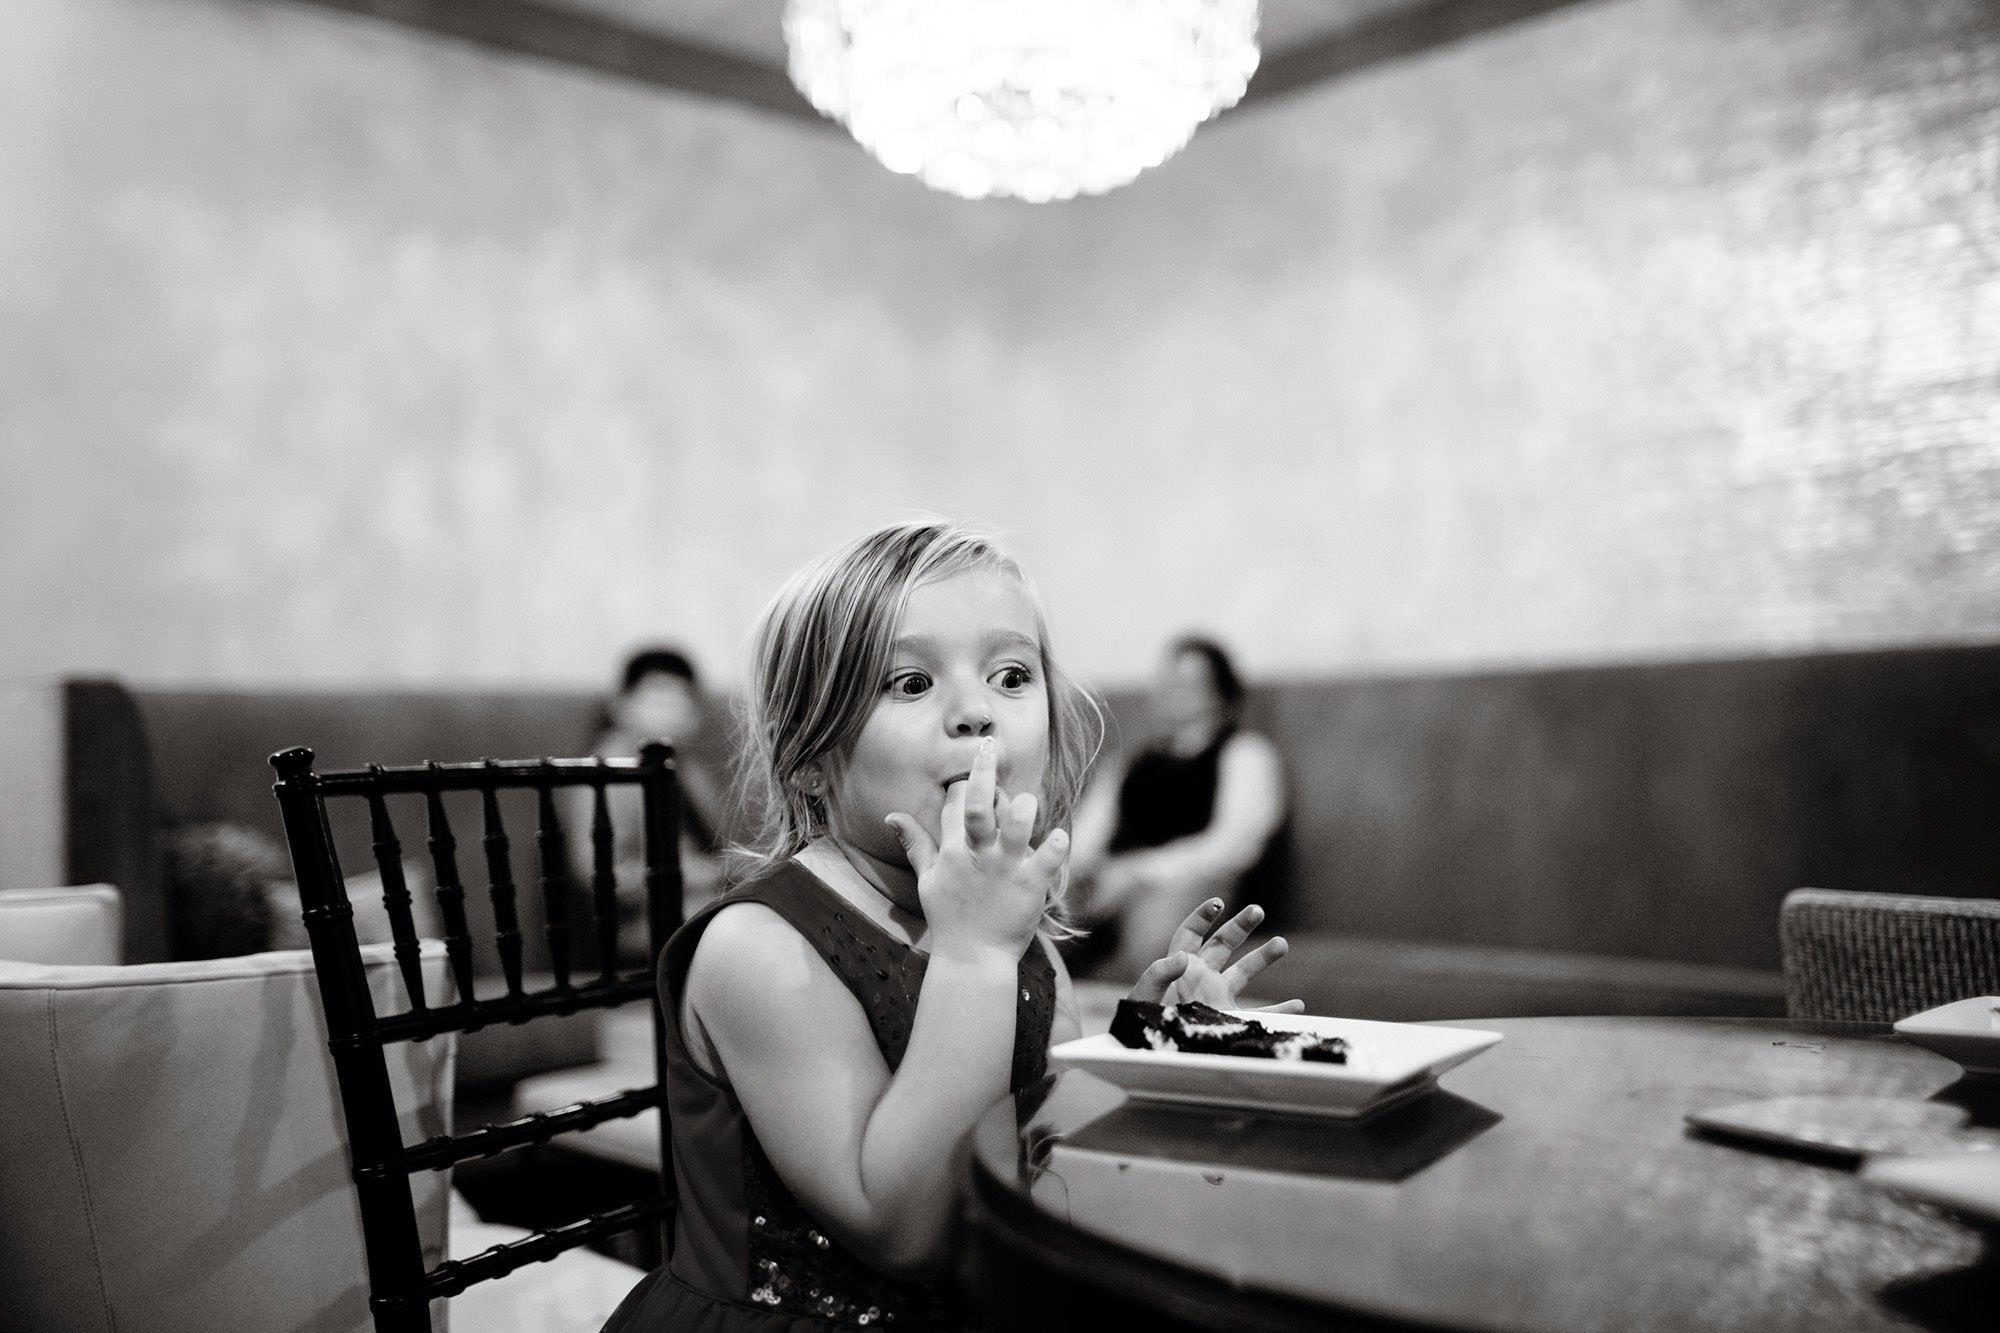 A girl enjoys her cake.